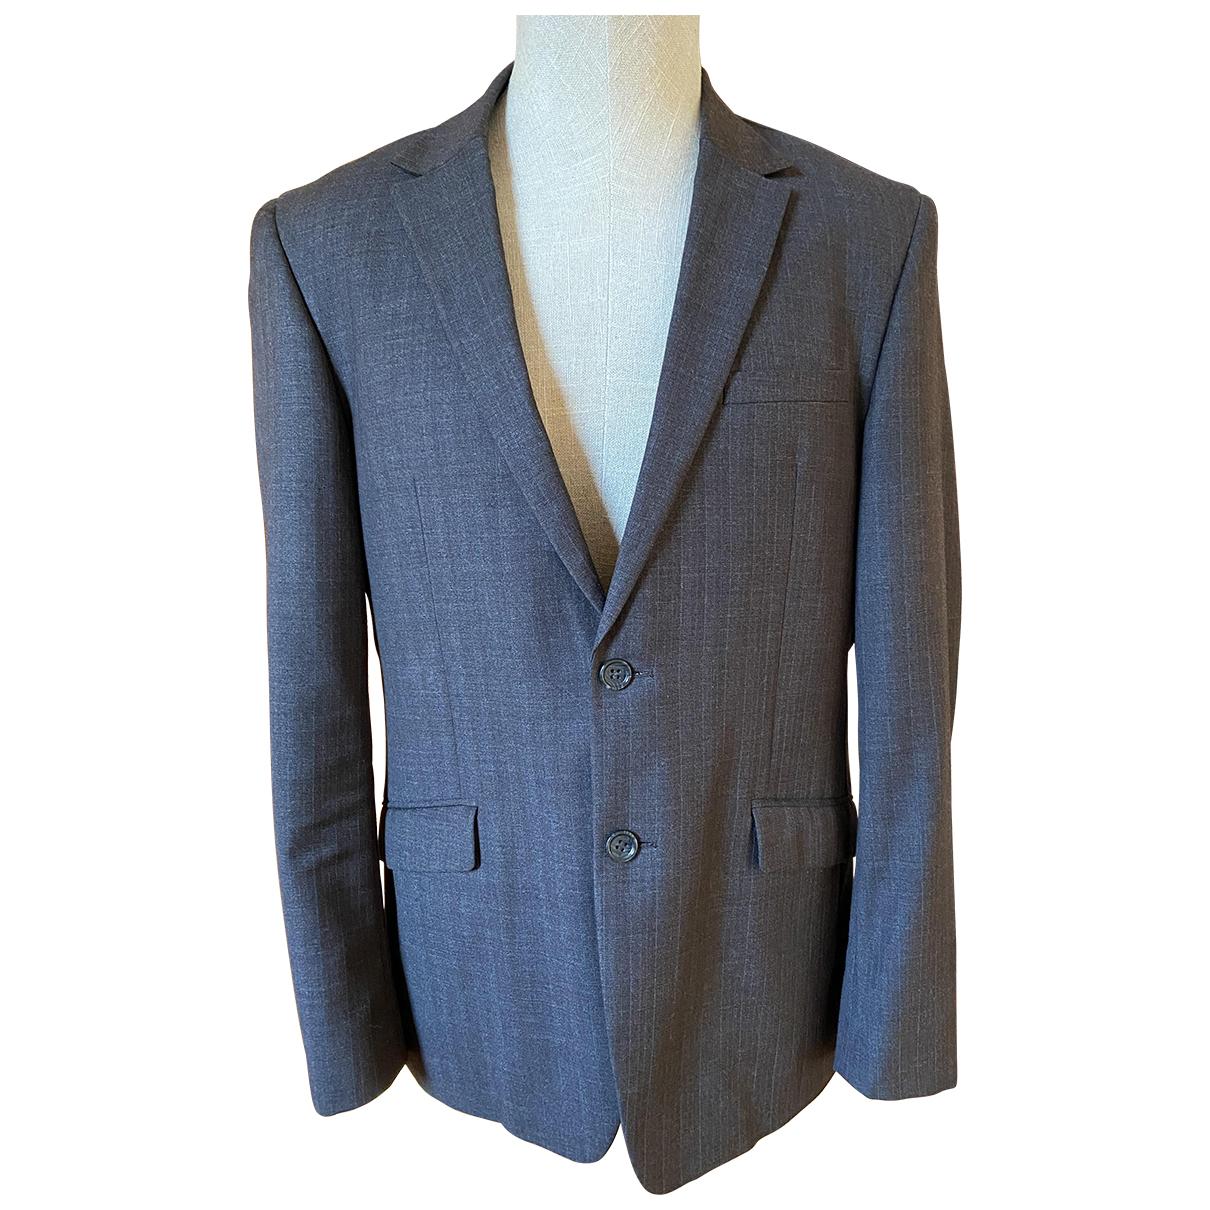 Selected N Wool Suits for Men 52 IT